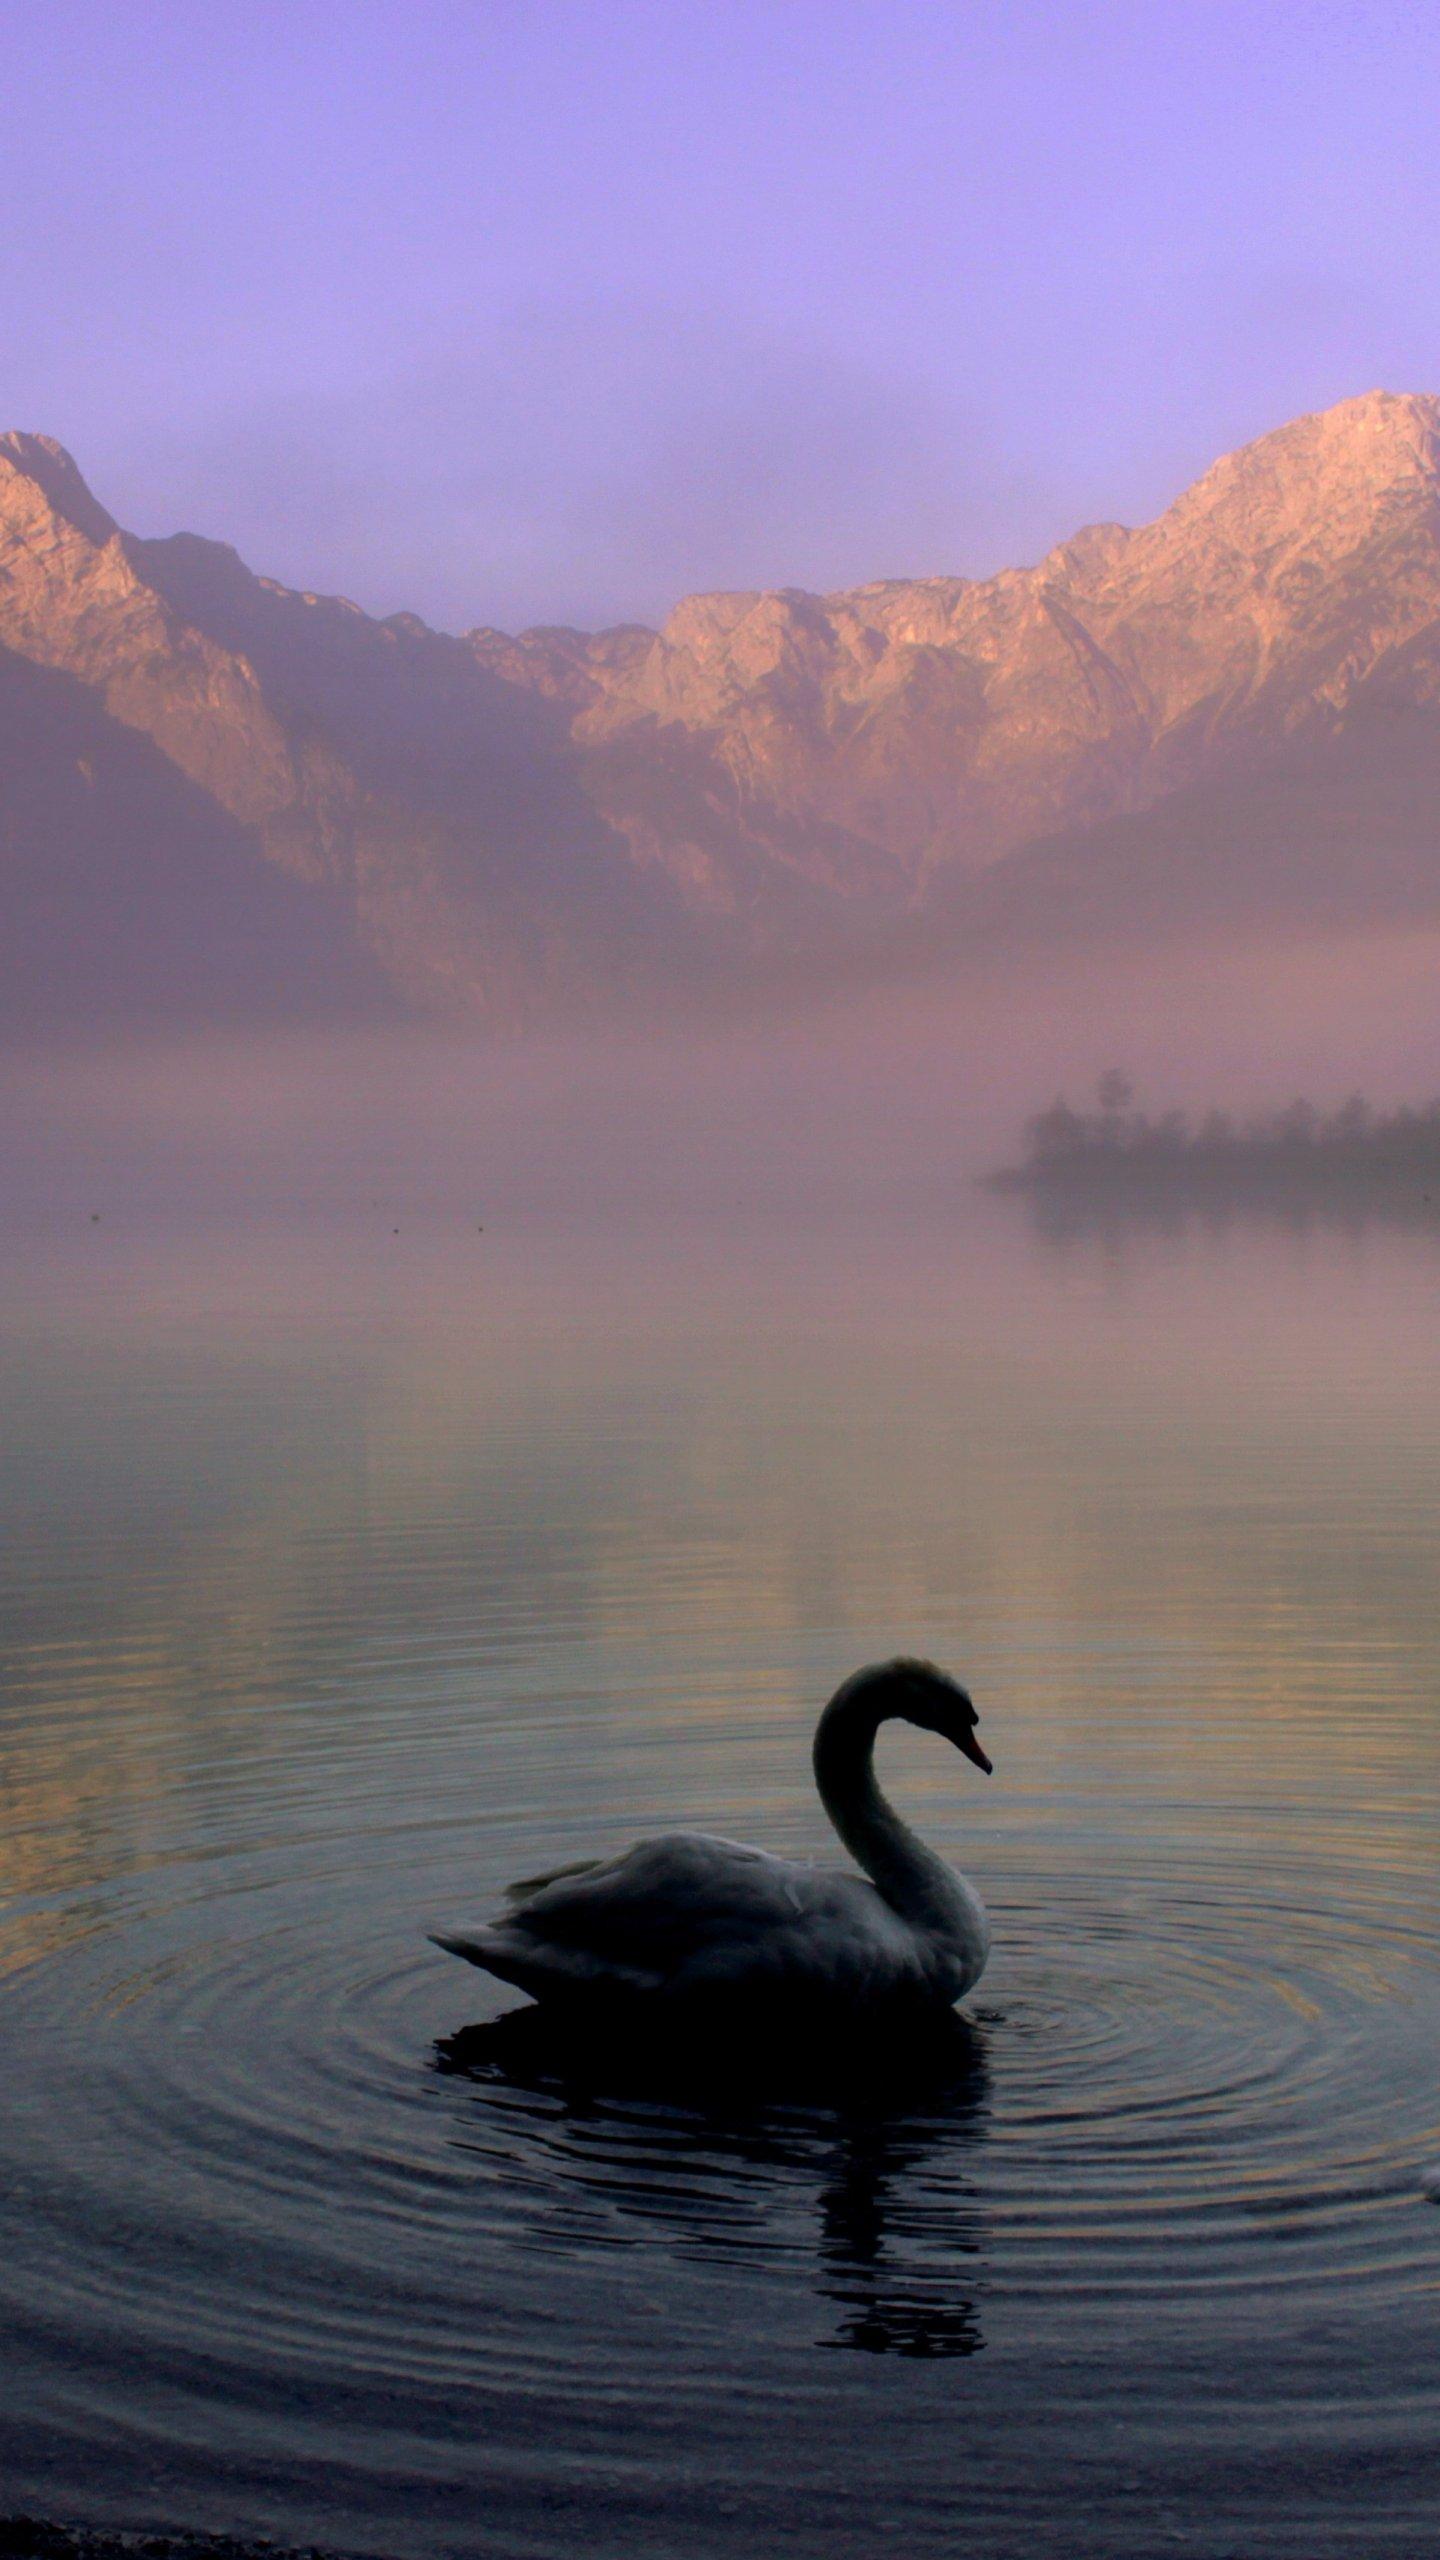 Swan in mountain lake wallpaper iphone android - Swan wallpapers for desktop ...